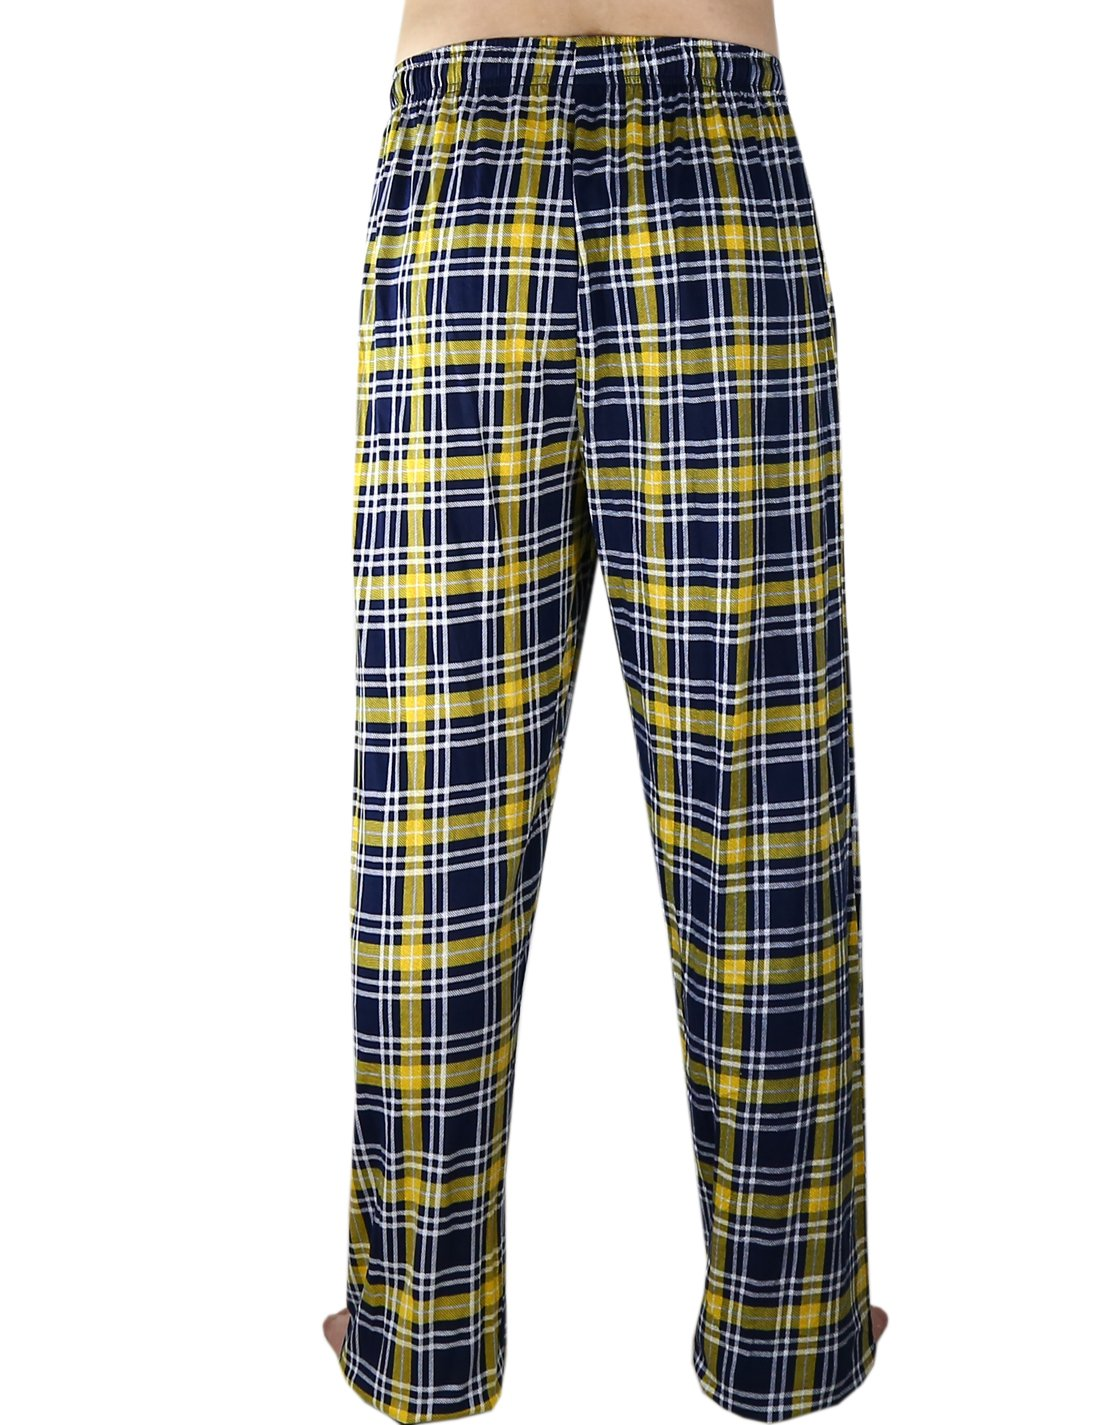 KANISA Pit Steelers Mens 100% Cotton Plaid Pajama/Sleepwear Pants - Multicolor Size M by KANISA (Image #2)